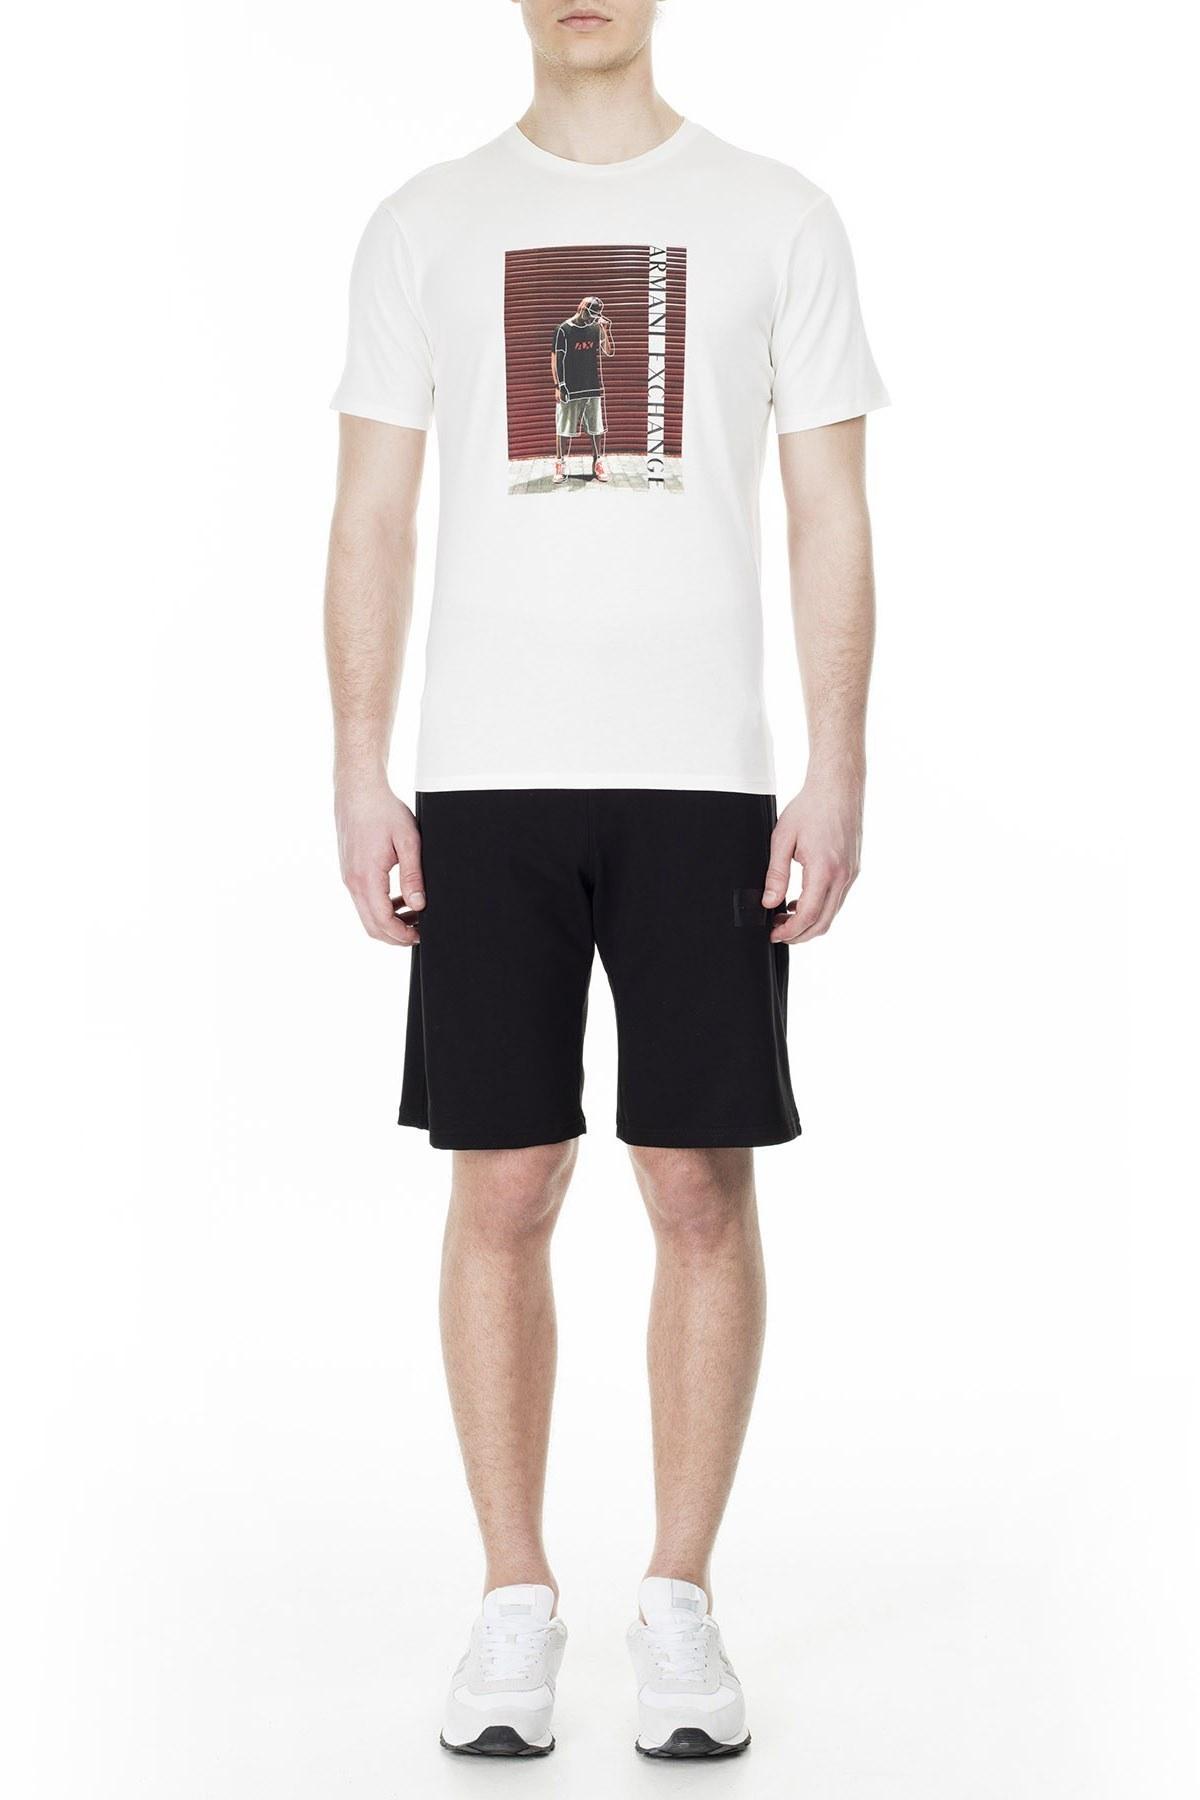 Armani Exchange Erkek T Shirt 3HZTBQ ZJN7Z 1100 BEYAZ